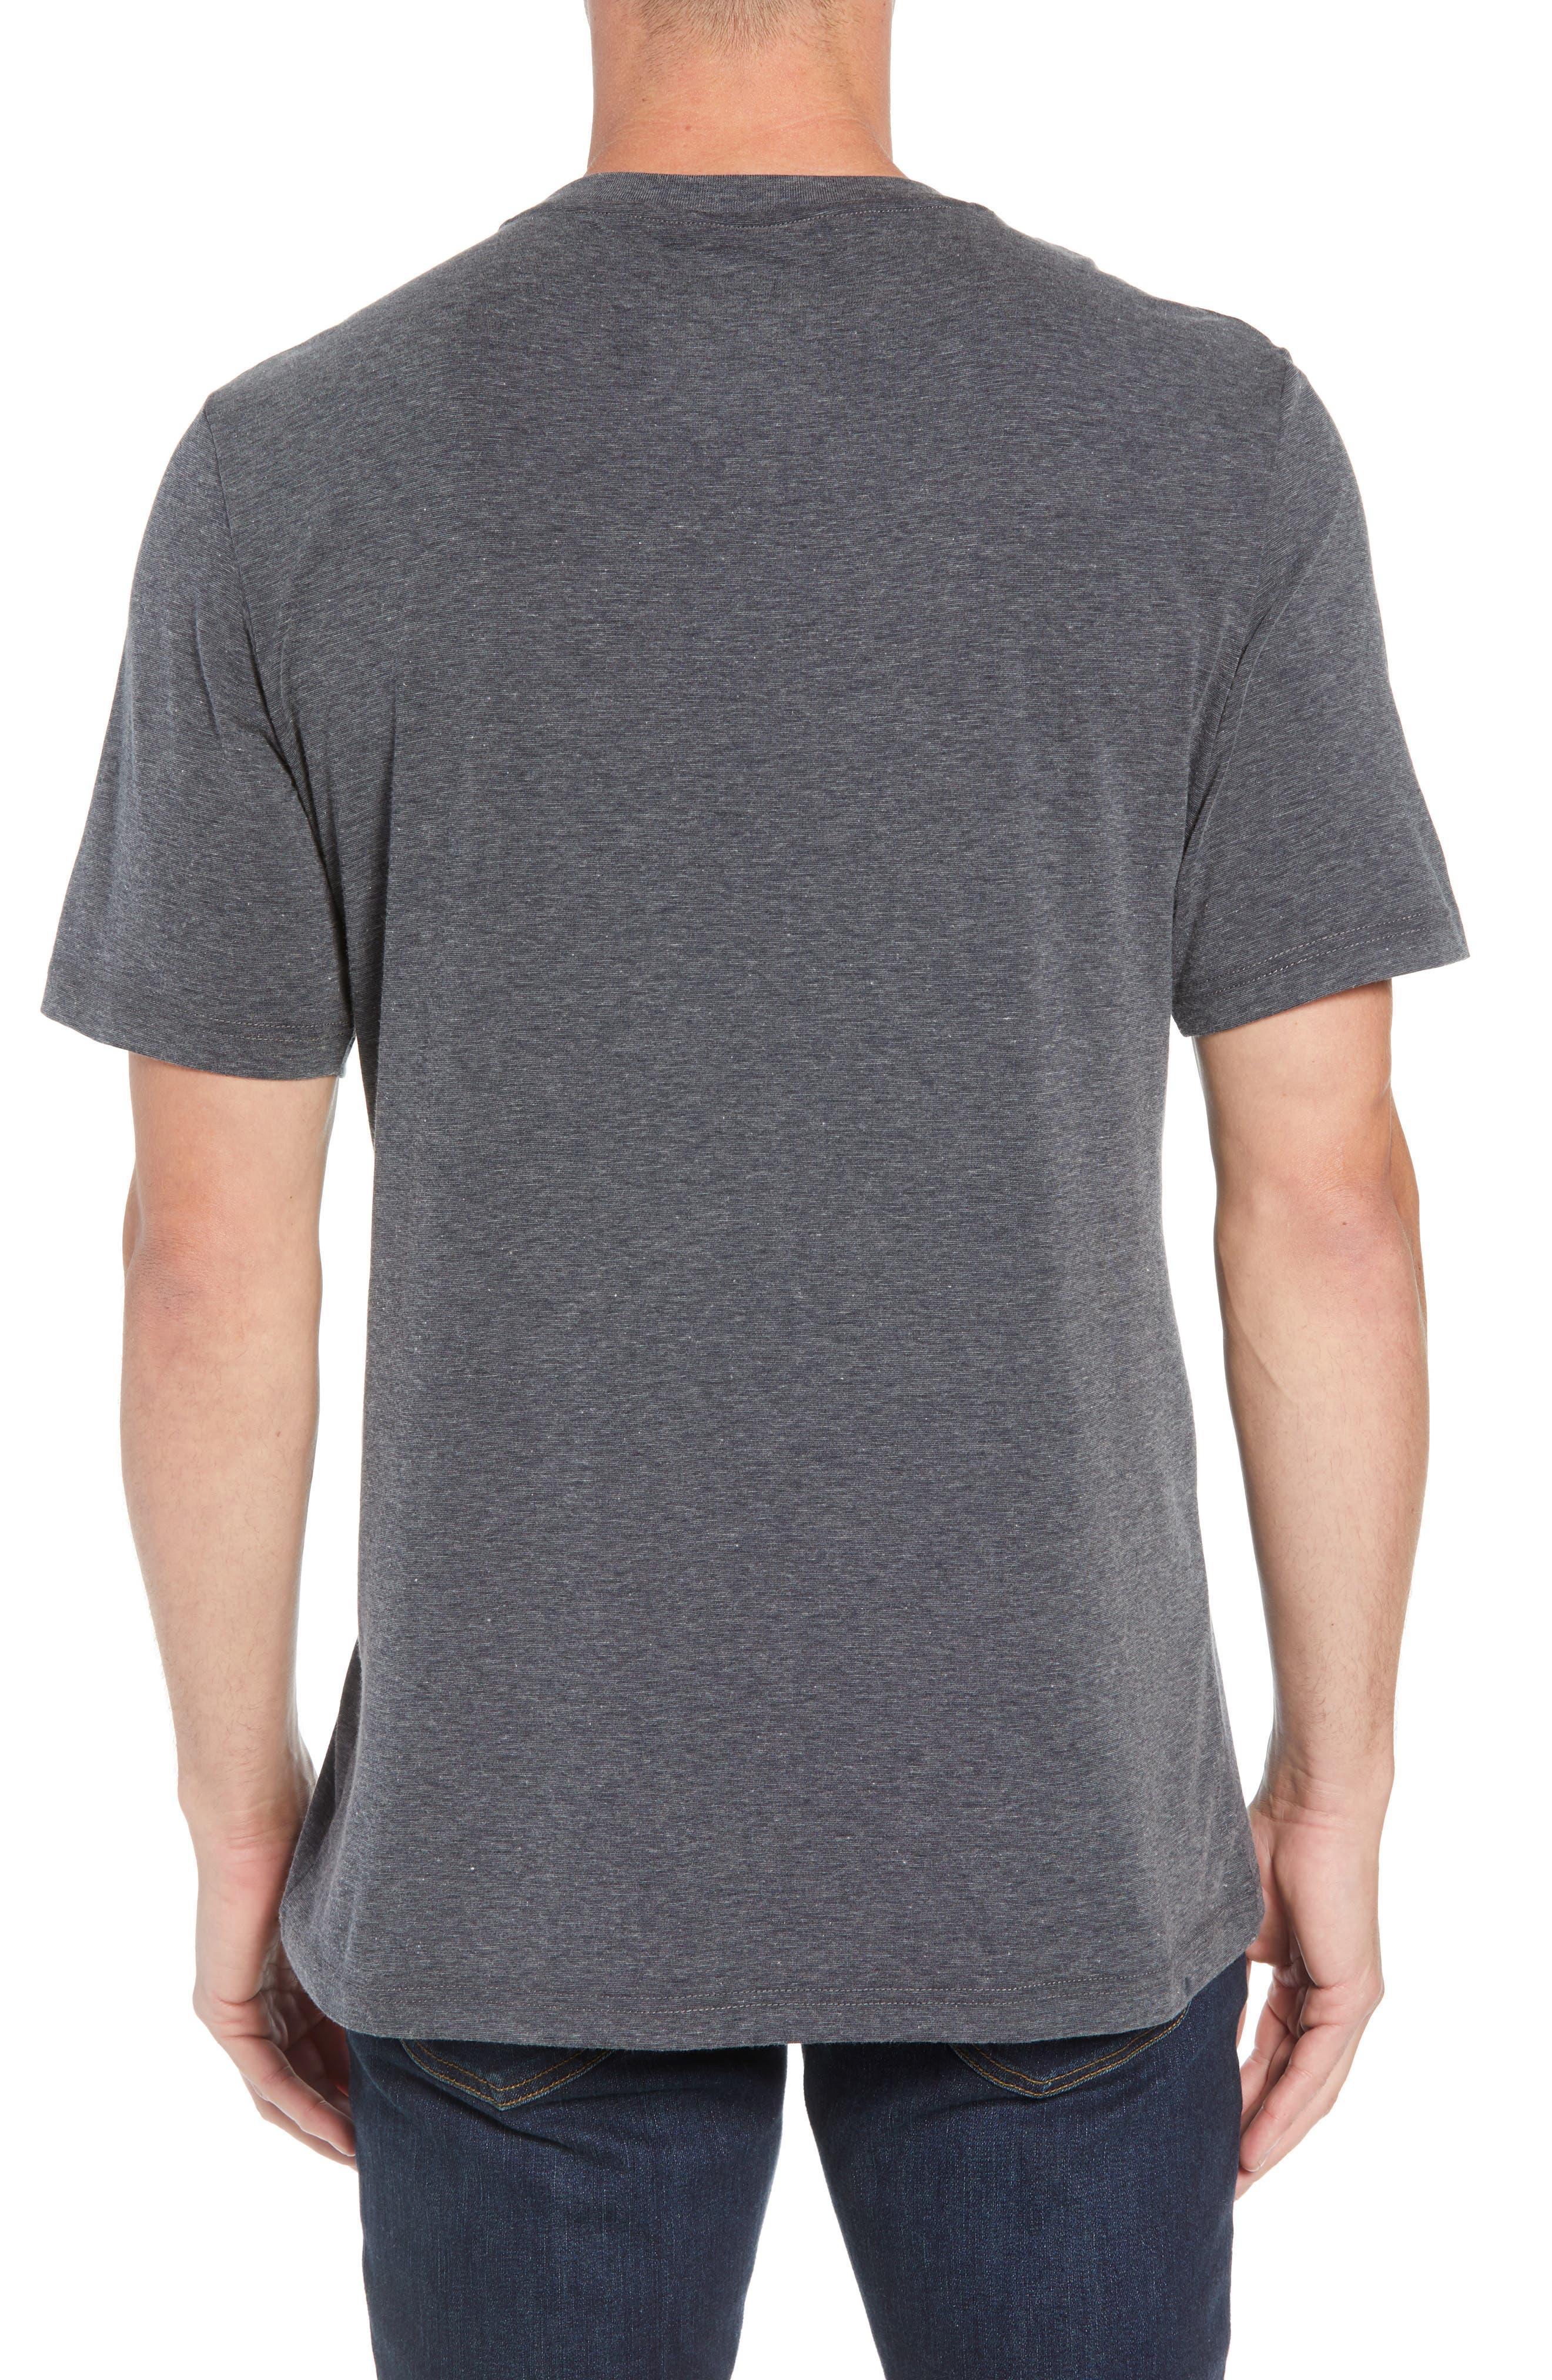 Recline Performance T-Shirt,                             Alternate thumbnail 2, color,                             HEATHER MAGNET